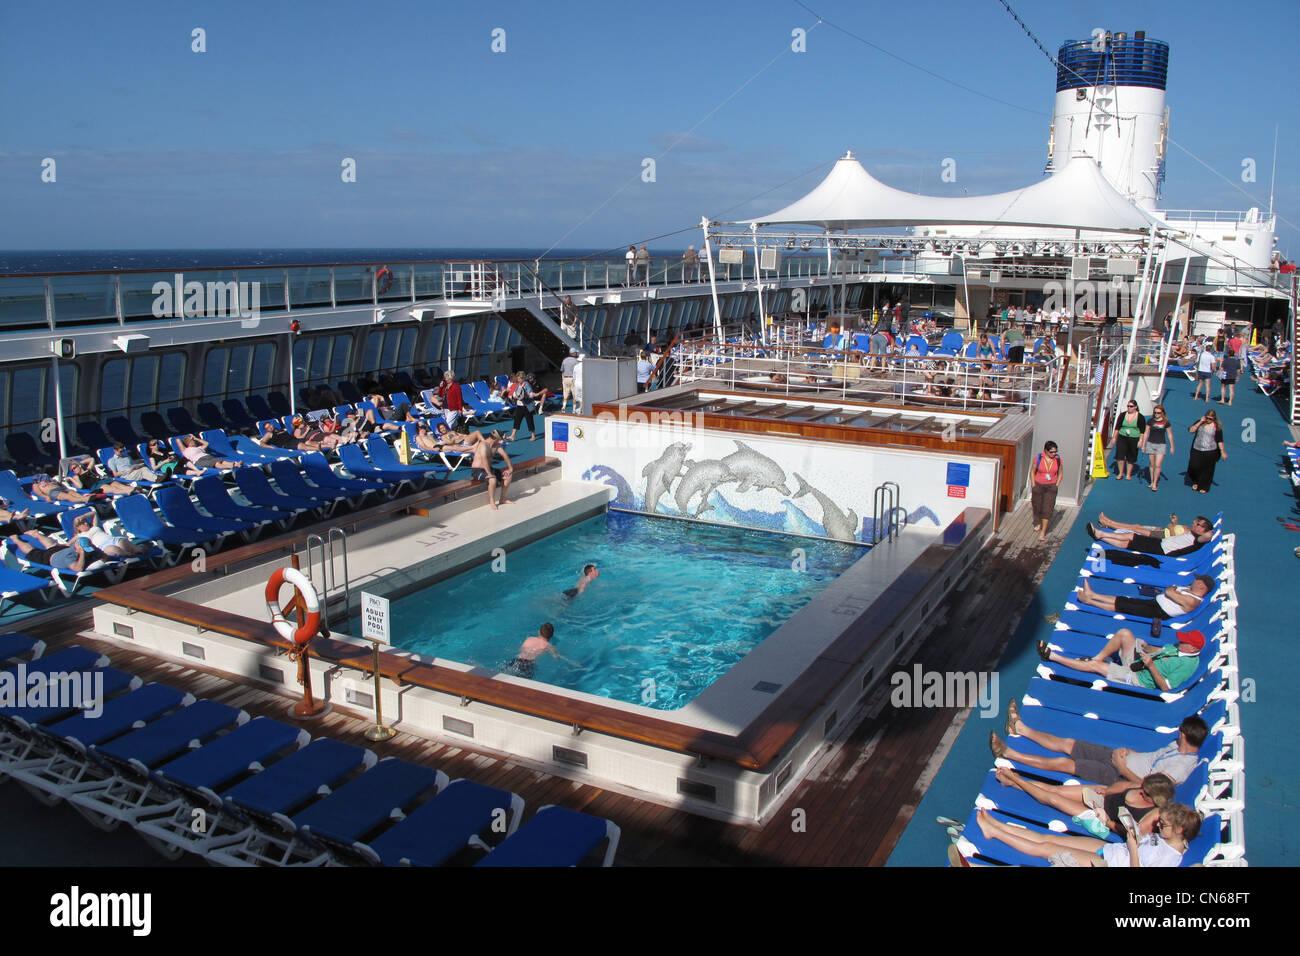 P And O Cruise Ship Pacific Dawn Stock Photo 47466940 Alamy